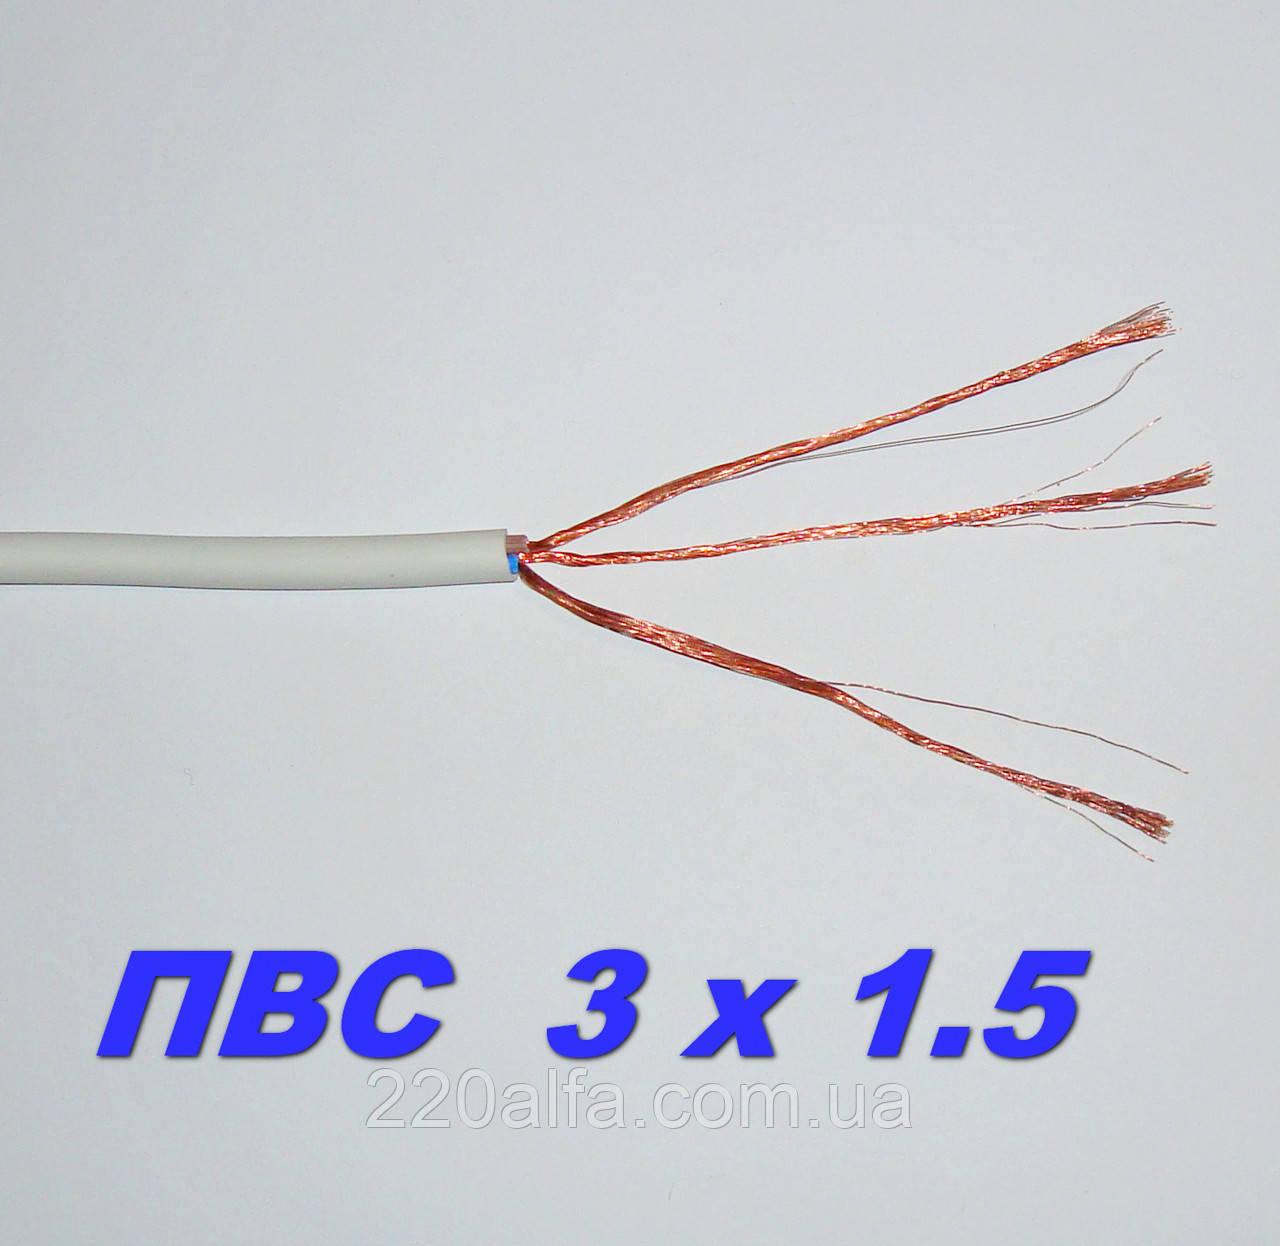 Медный провод ПВС 3х 1.5 нагрузка до 3000 W